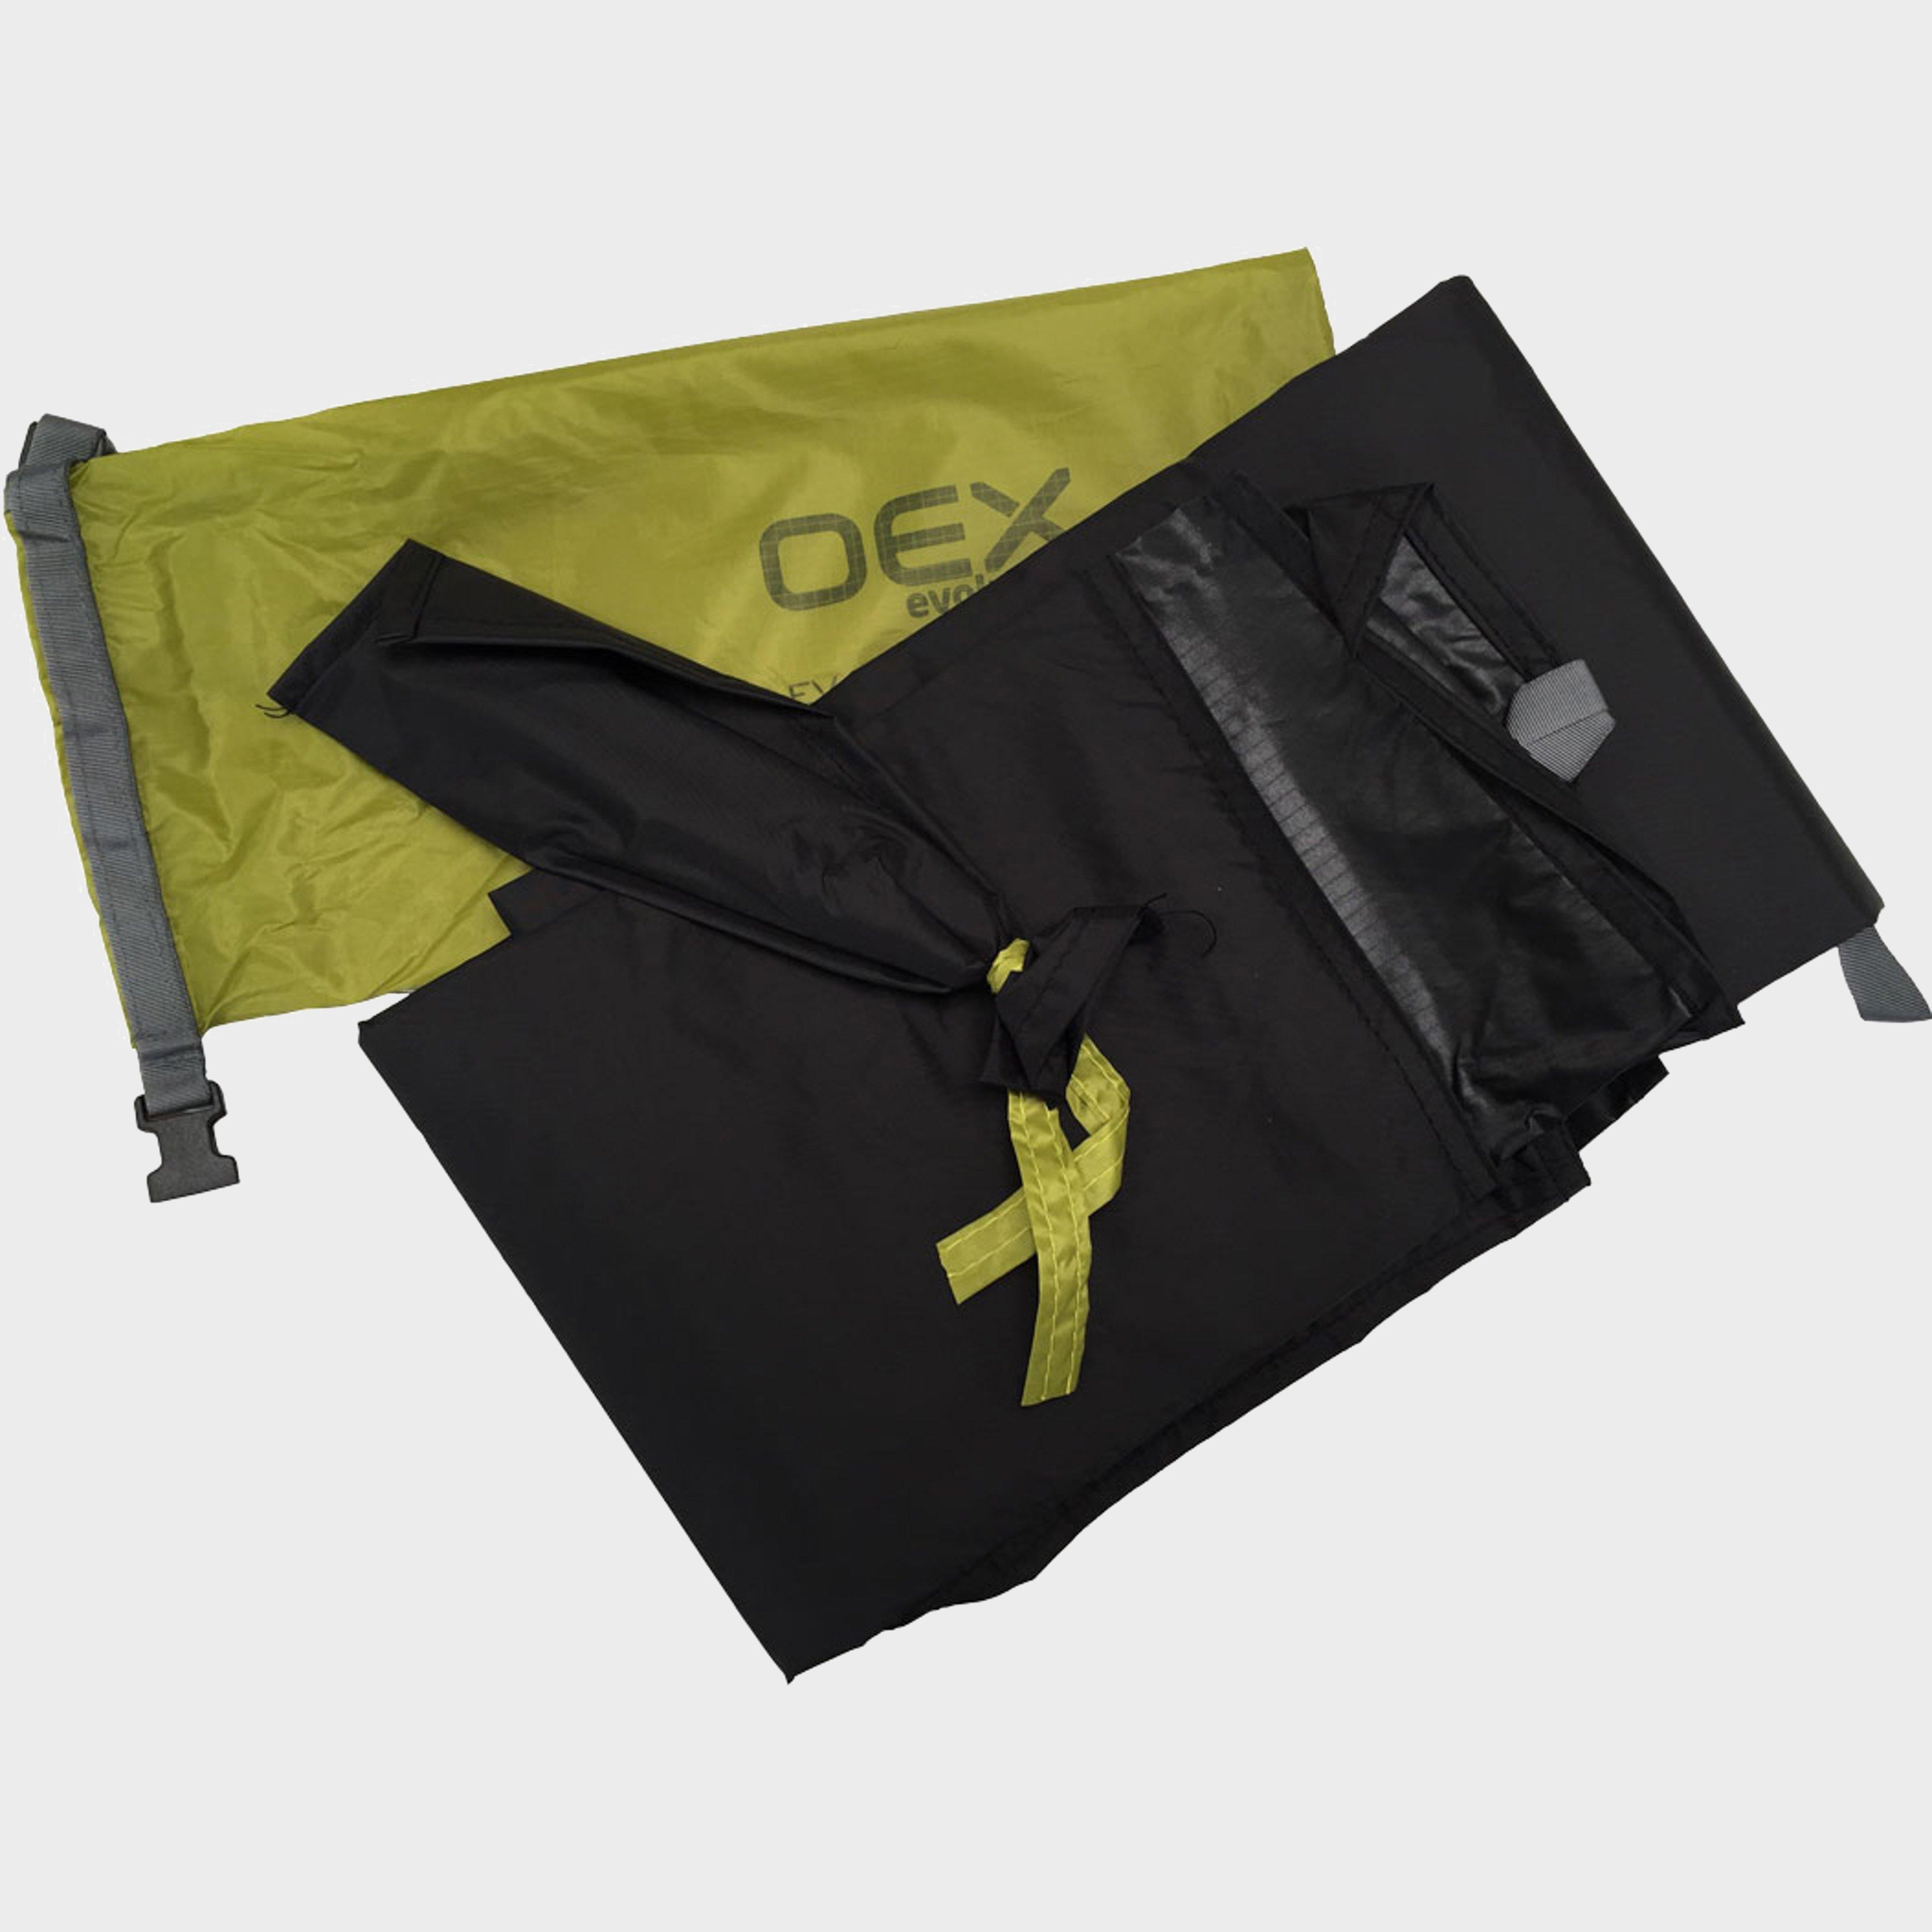 Oex Lynx Ev Ii Footprint - Black/Groundsheet, Black